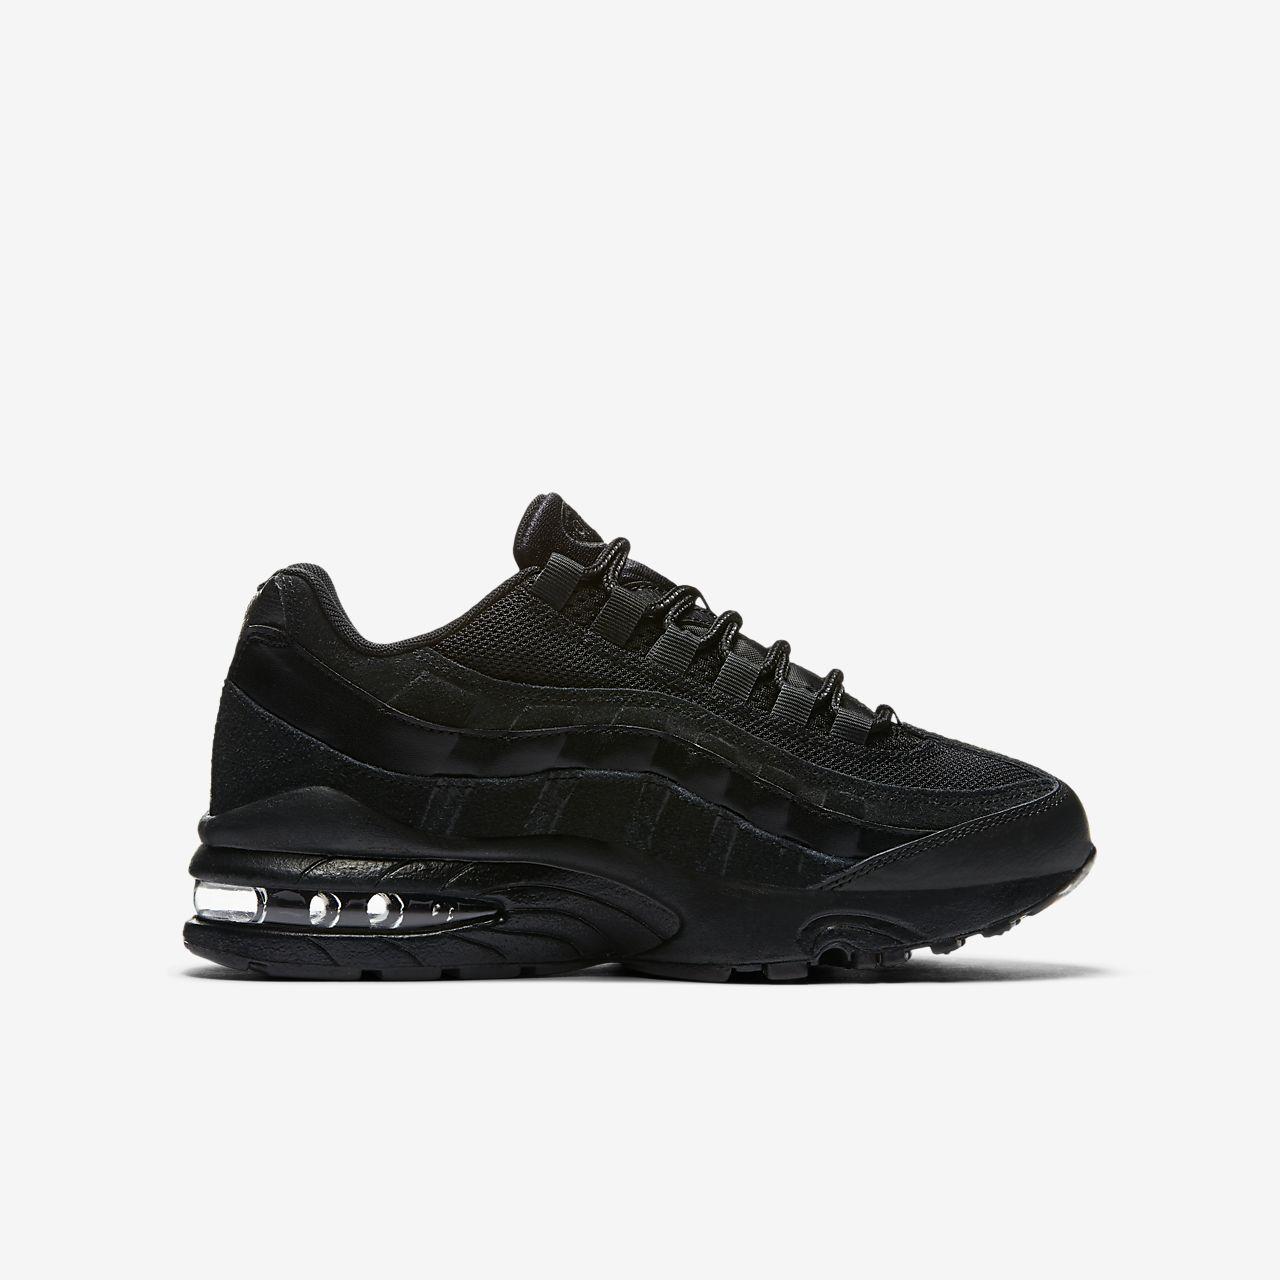 Nike Air Max 95 Chaussures À 40,5 Pour Les Femmes